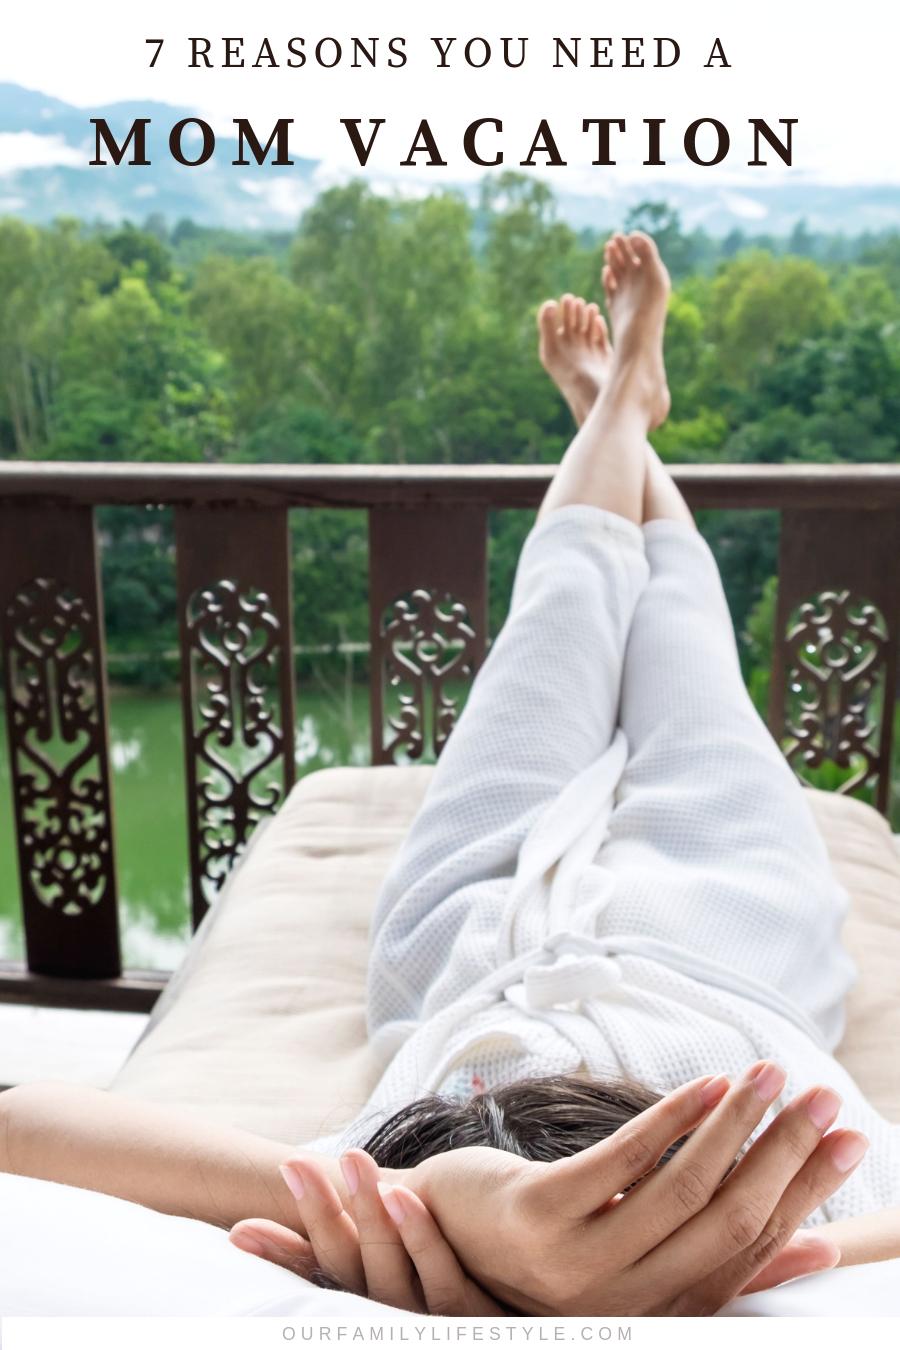 7 Reasons You Need a Mom Vacation